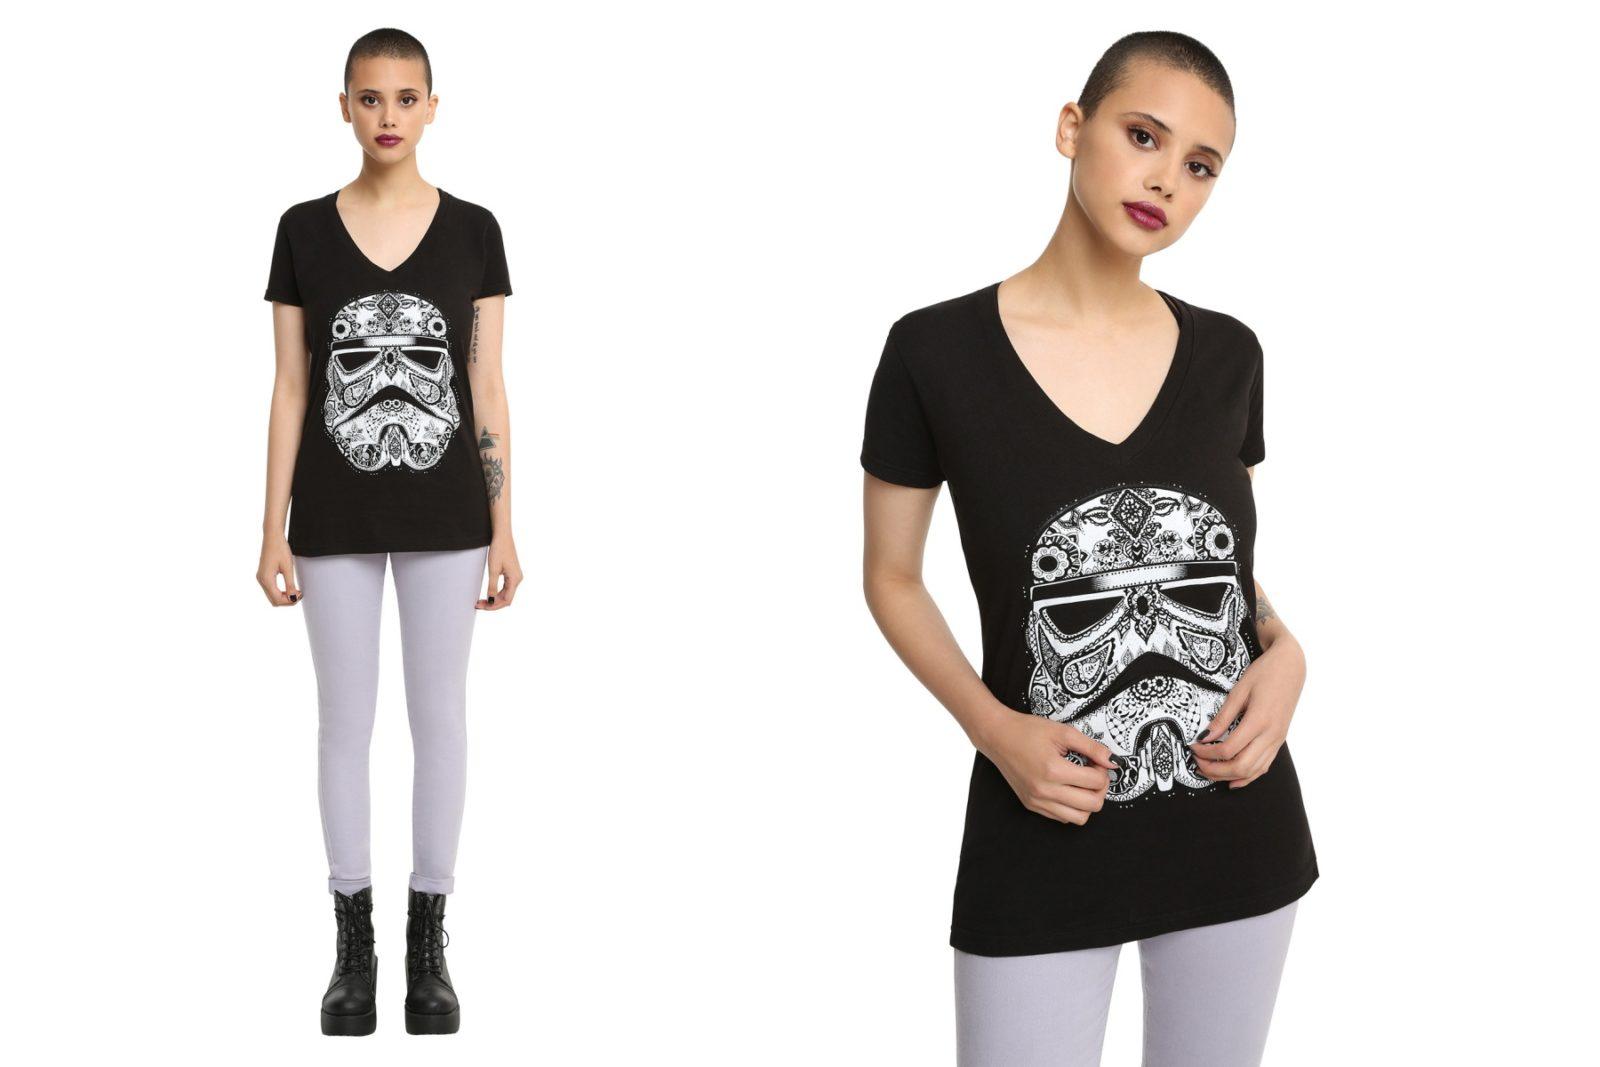 Women's Star Wars Paisley Stormtrooper t-shirt at Hot Topic